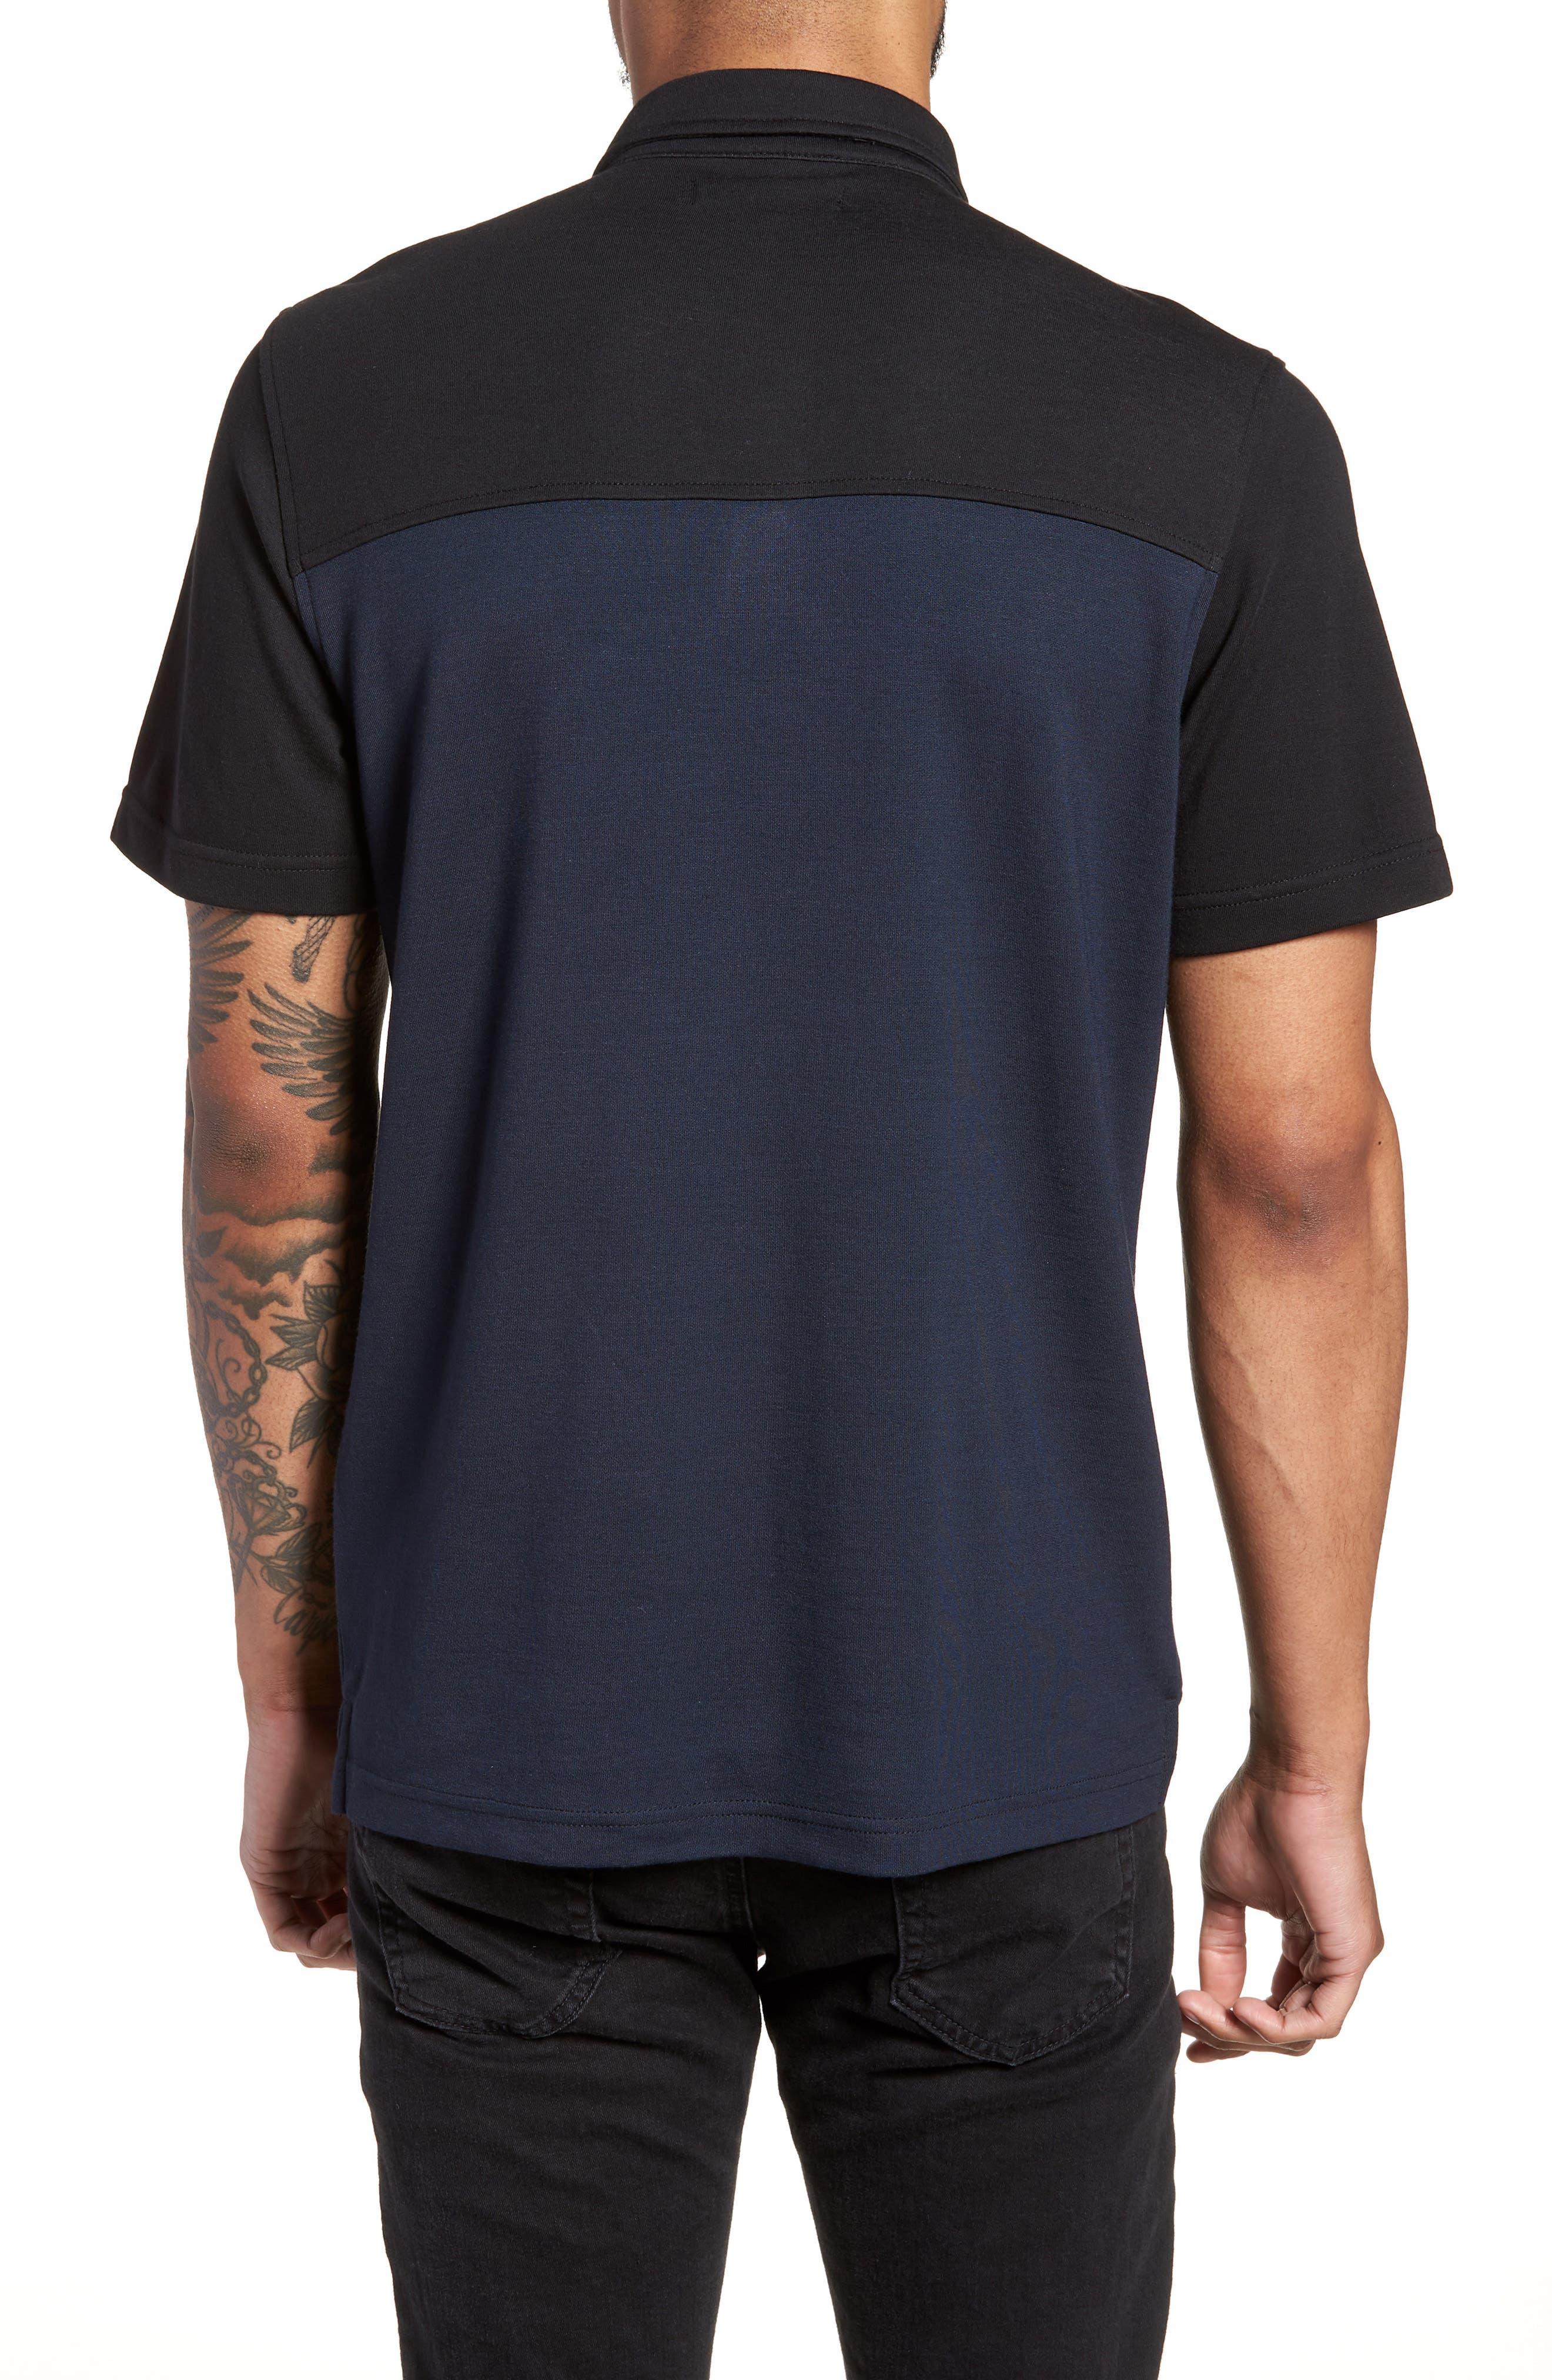 Trim Fit Colorblock Short Sleeve Polo,                             Alternate thumbnail 2, color,                             Navy Black